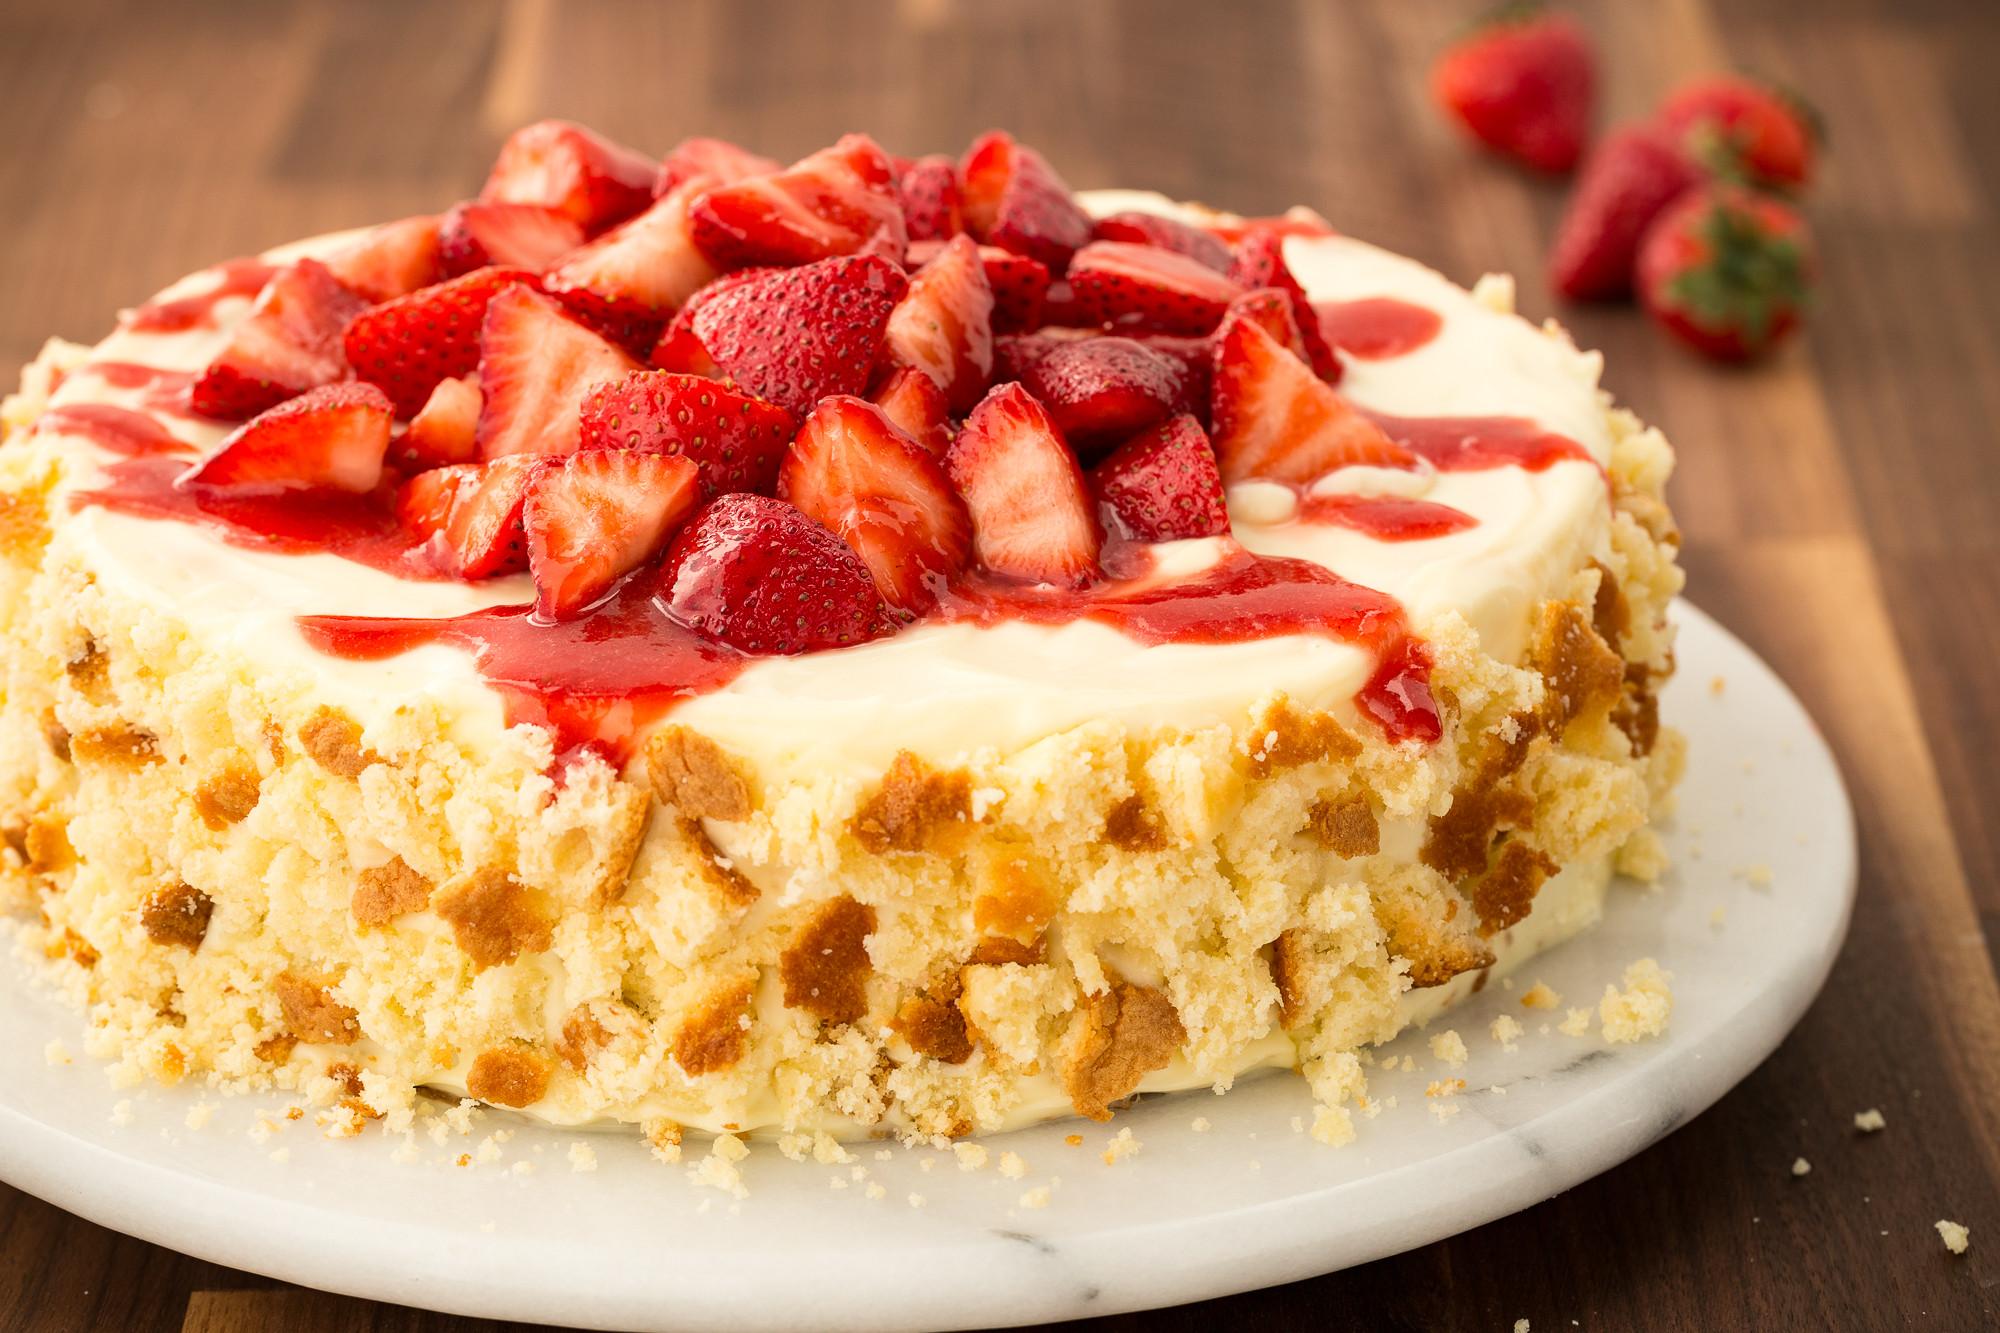 Dessert With Strawberries  19 Strawberries & Cream Dessert Ideas & Recipes—Delish